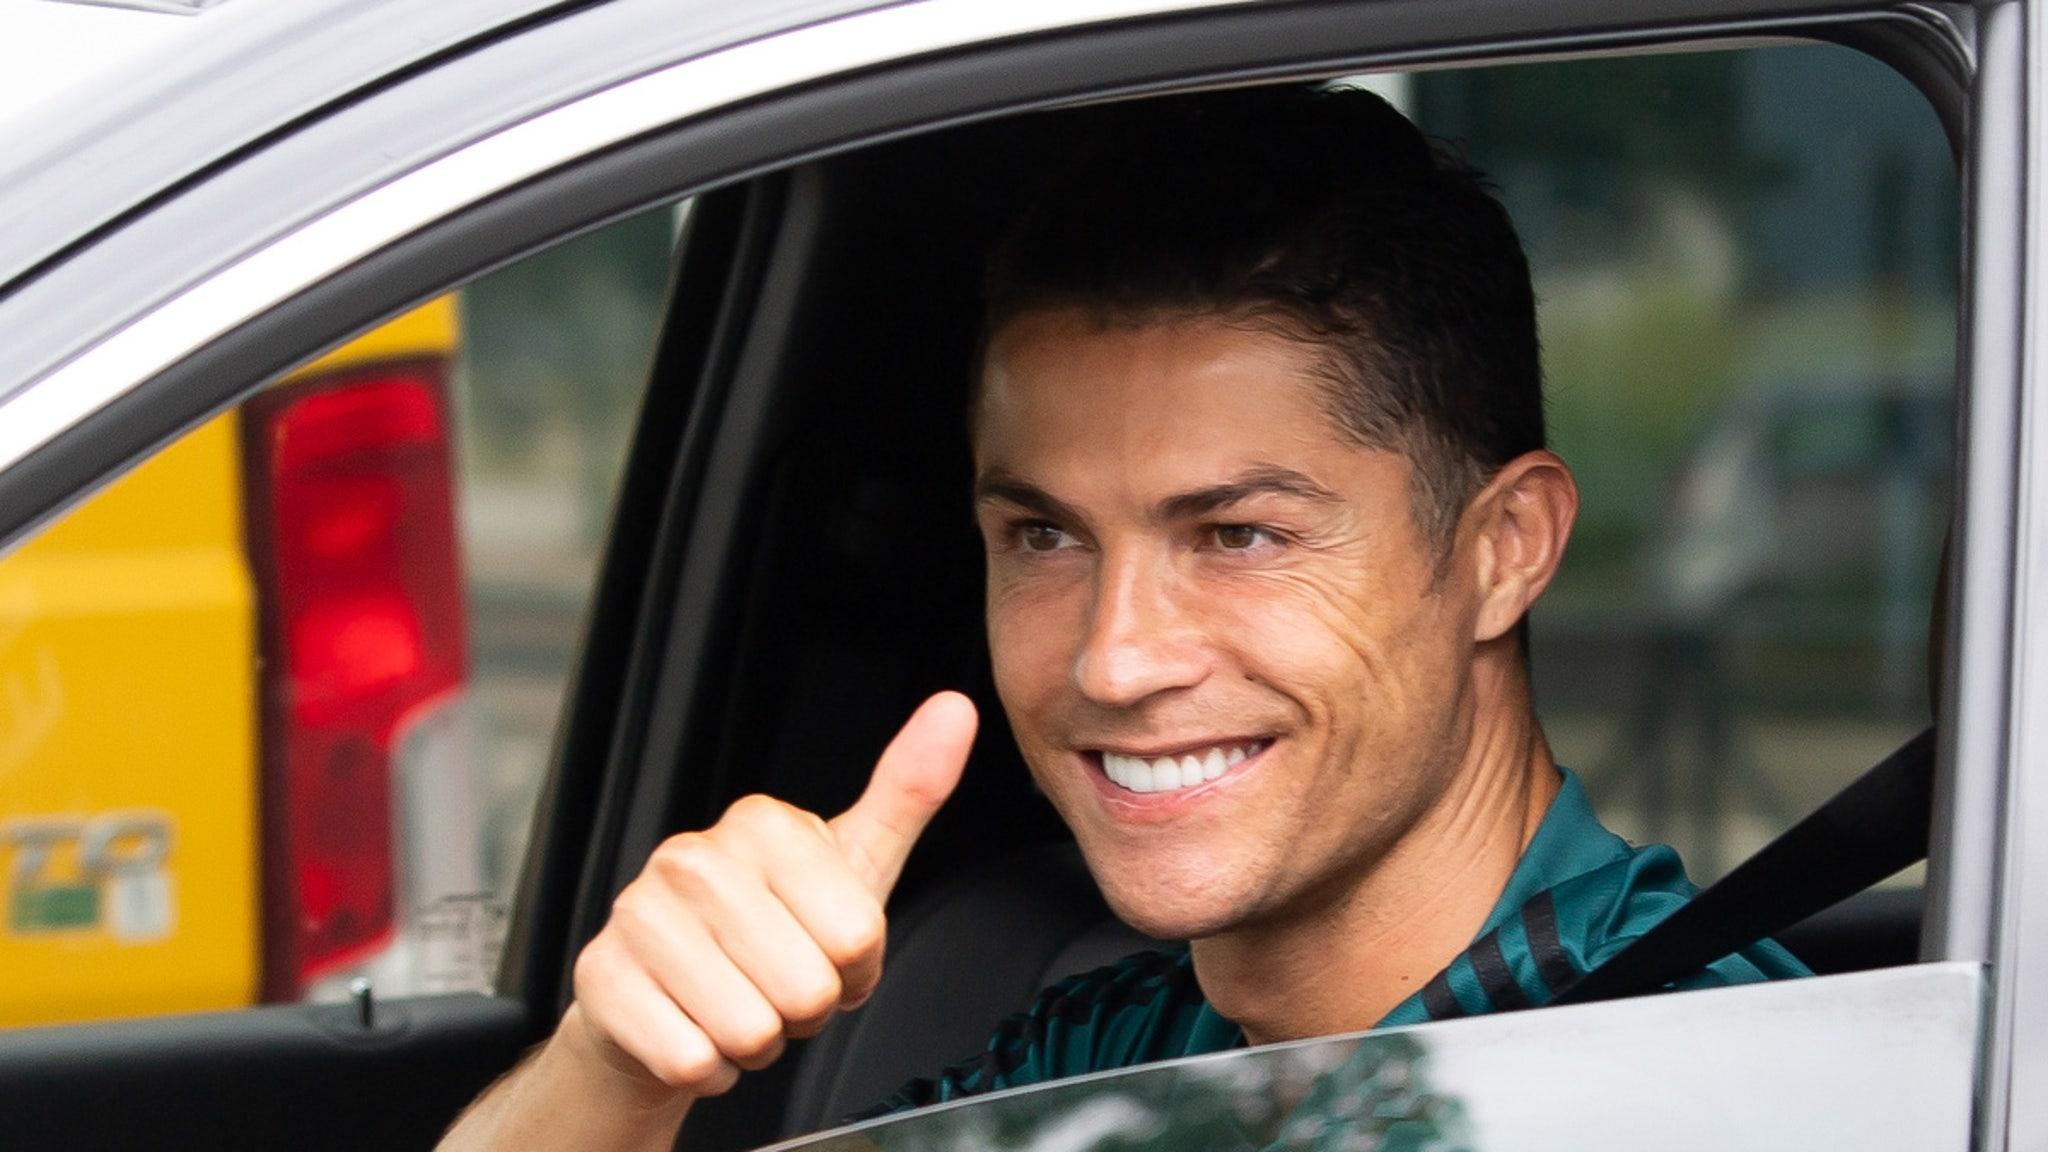 Cristiano Ronaldo Returns to Juventus Facility in Italy, All Smiles, Baby!